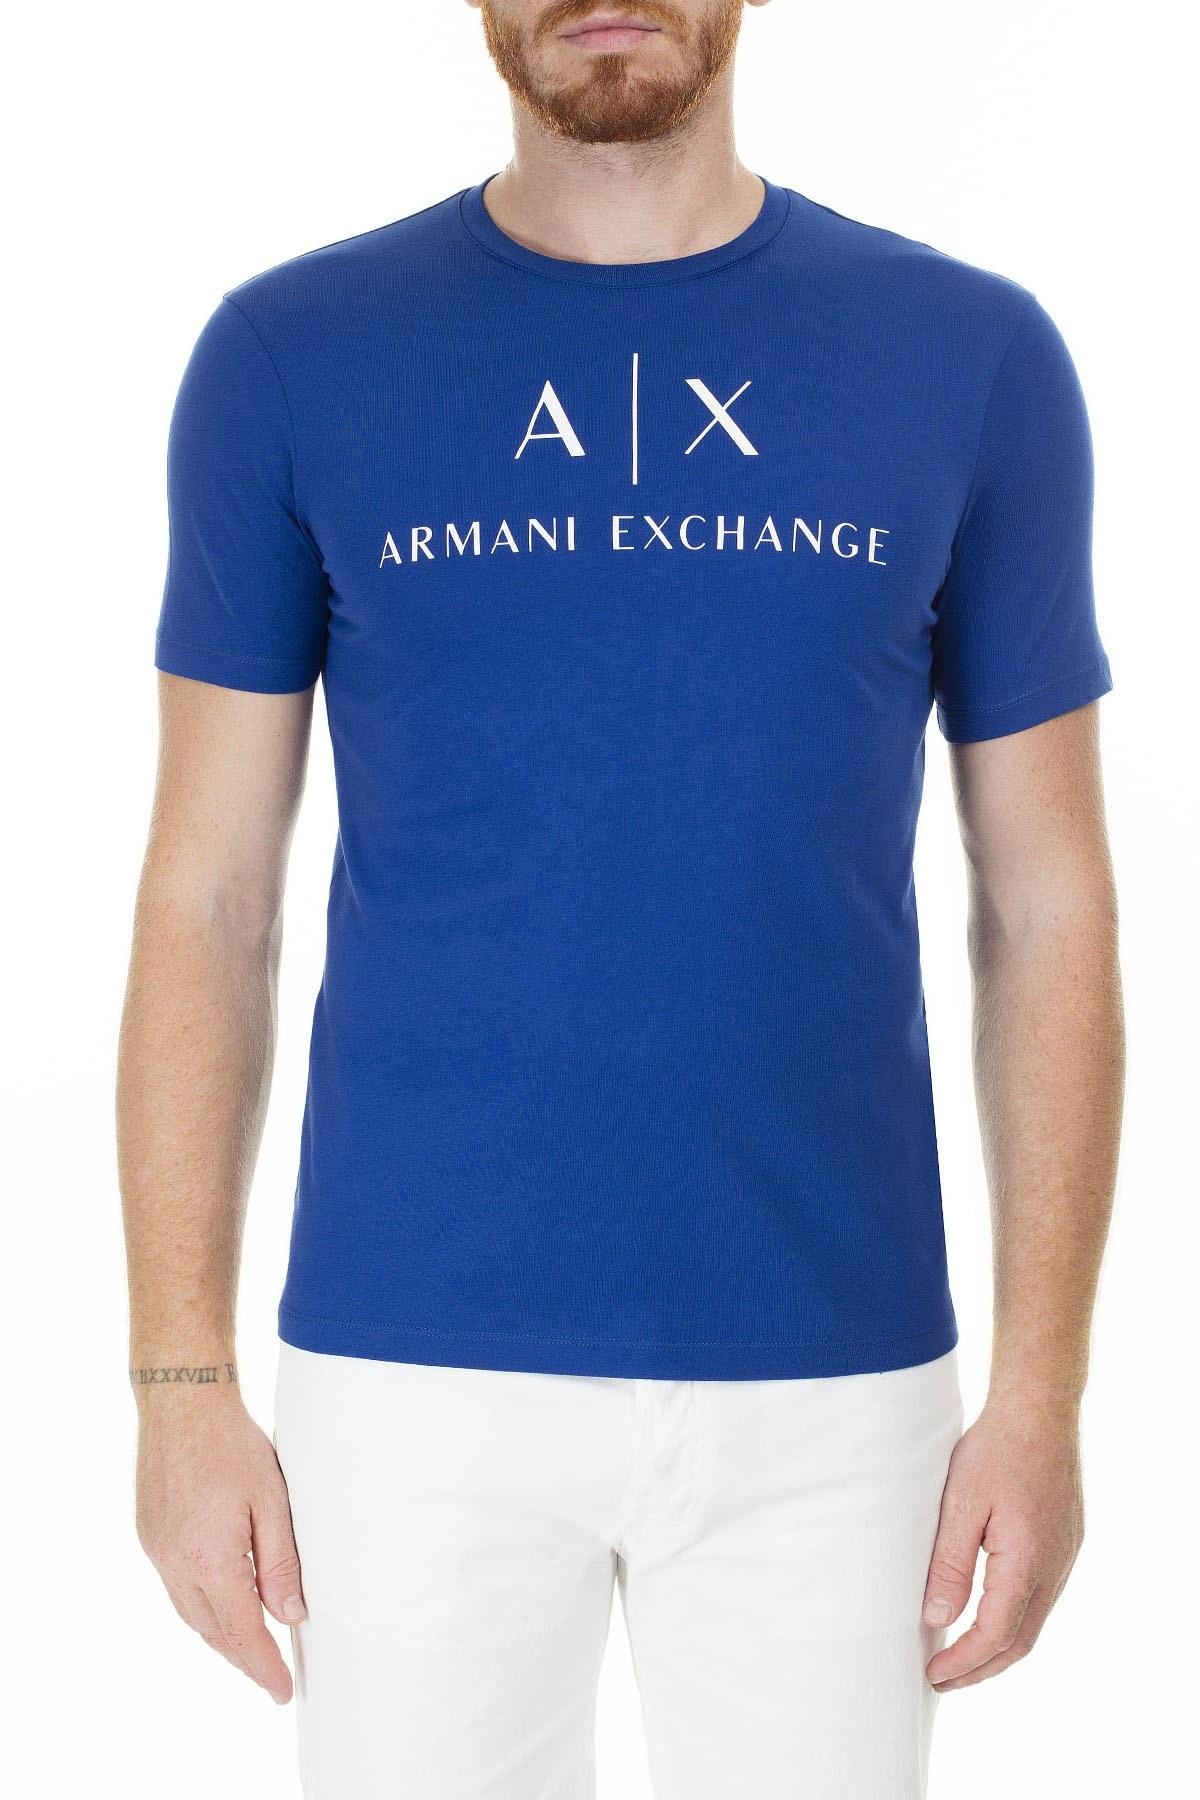 Armani Exchange Baskılı Bisiklet Yaka Erkek T Shirt 8NZTCJ Z8H4Z 1511 SAKS